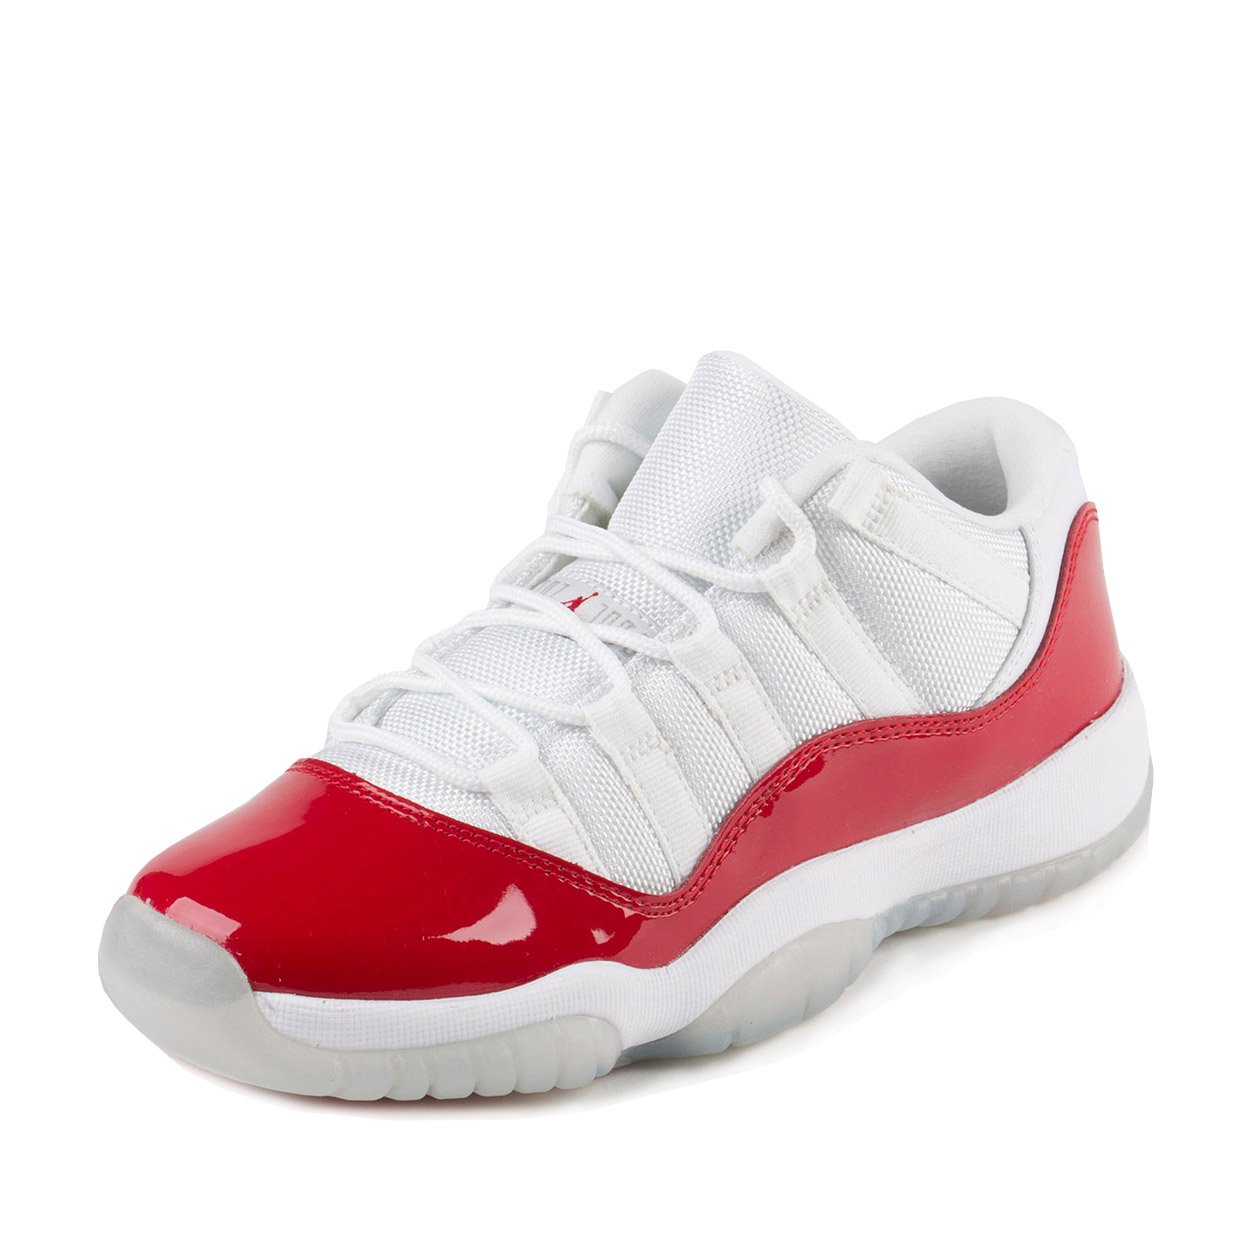 Jordan Nike Boys Air 11 Retro Low BG White/Varsity Red-Black Leather Size 6.5Y by Jordan